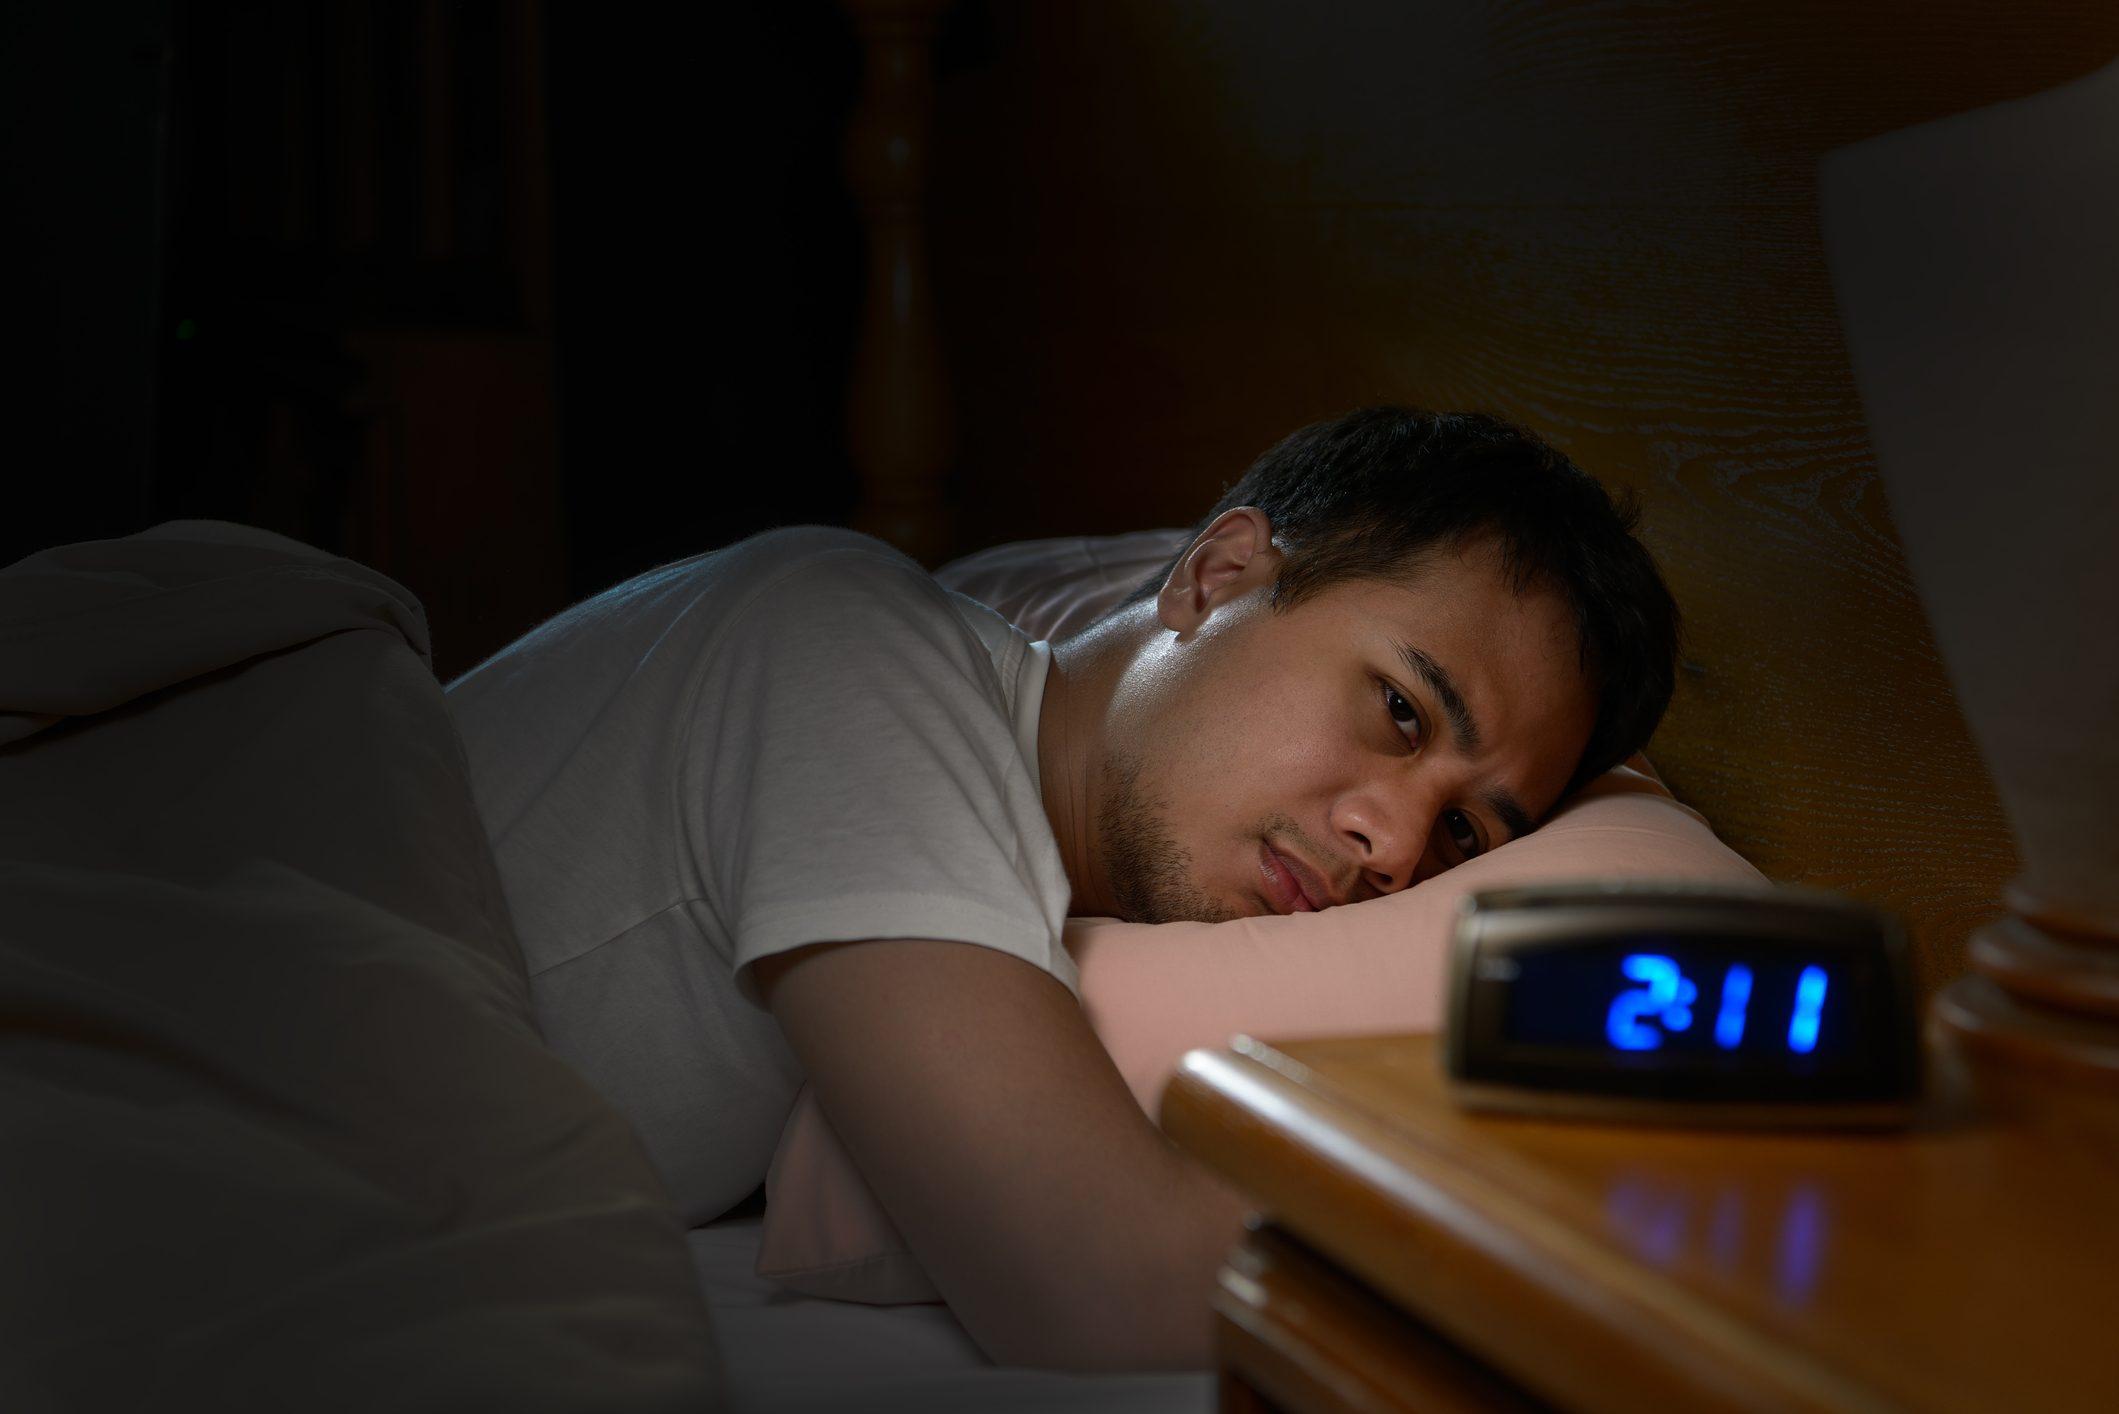 man unable to sleep at night